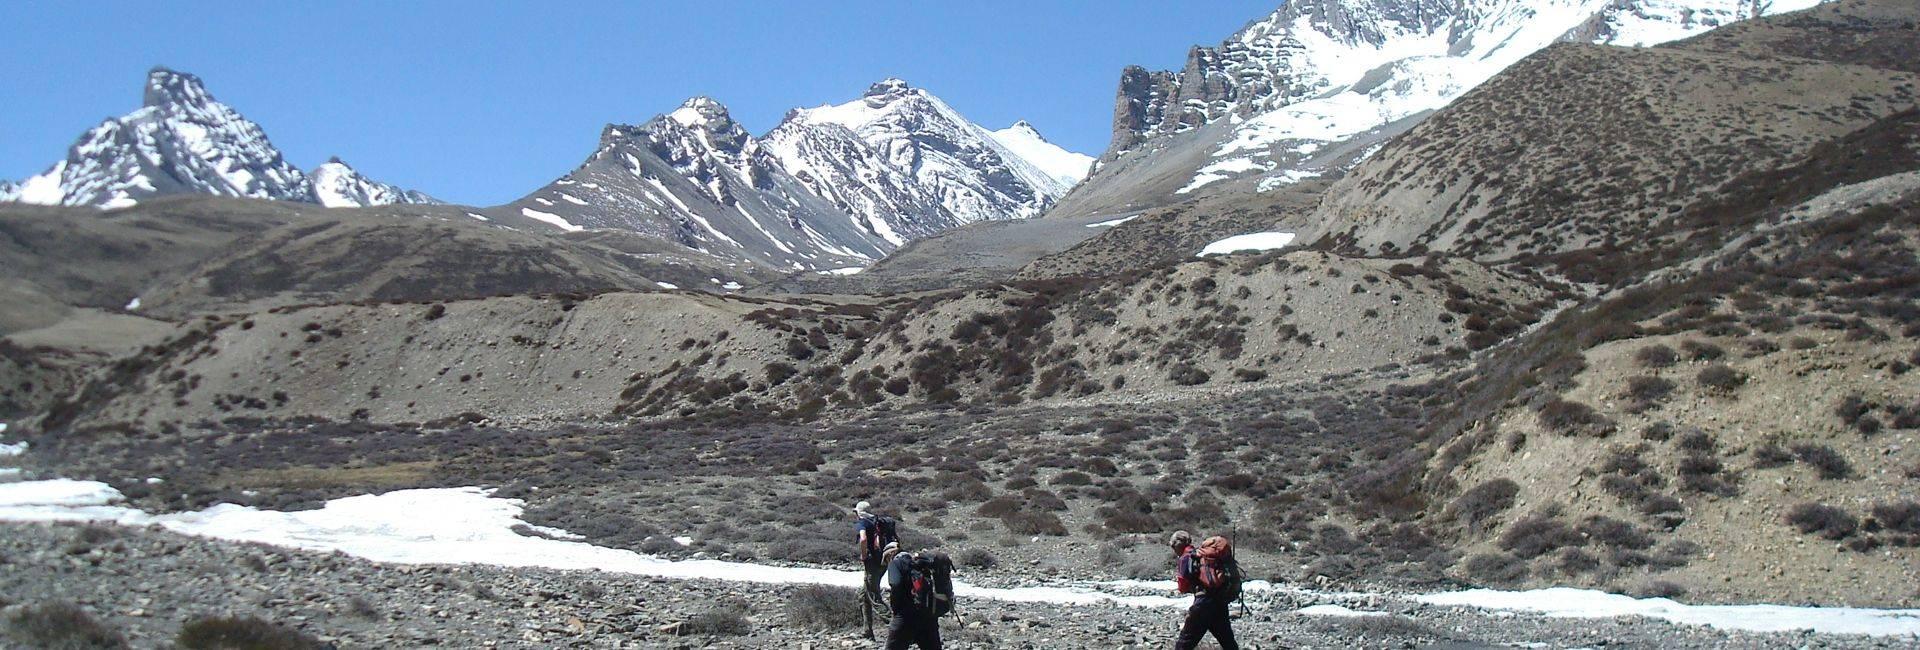 Upper Dolpo GHT trek in Nepal